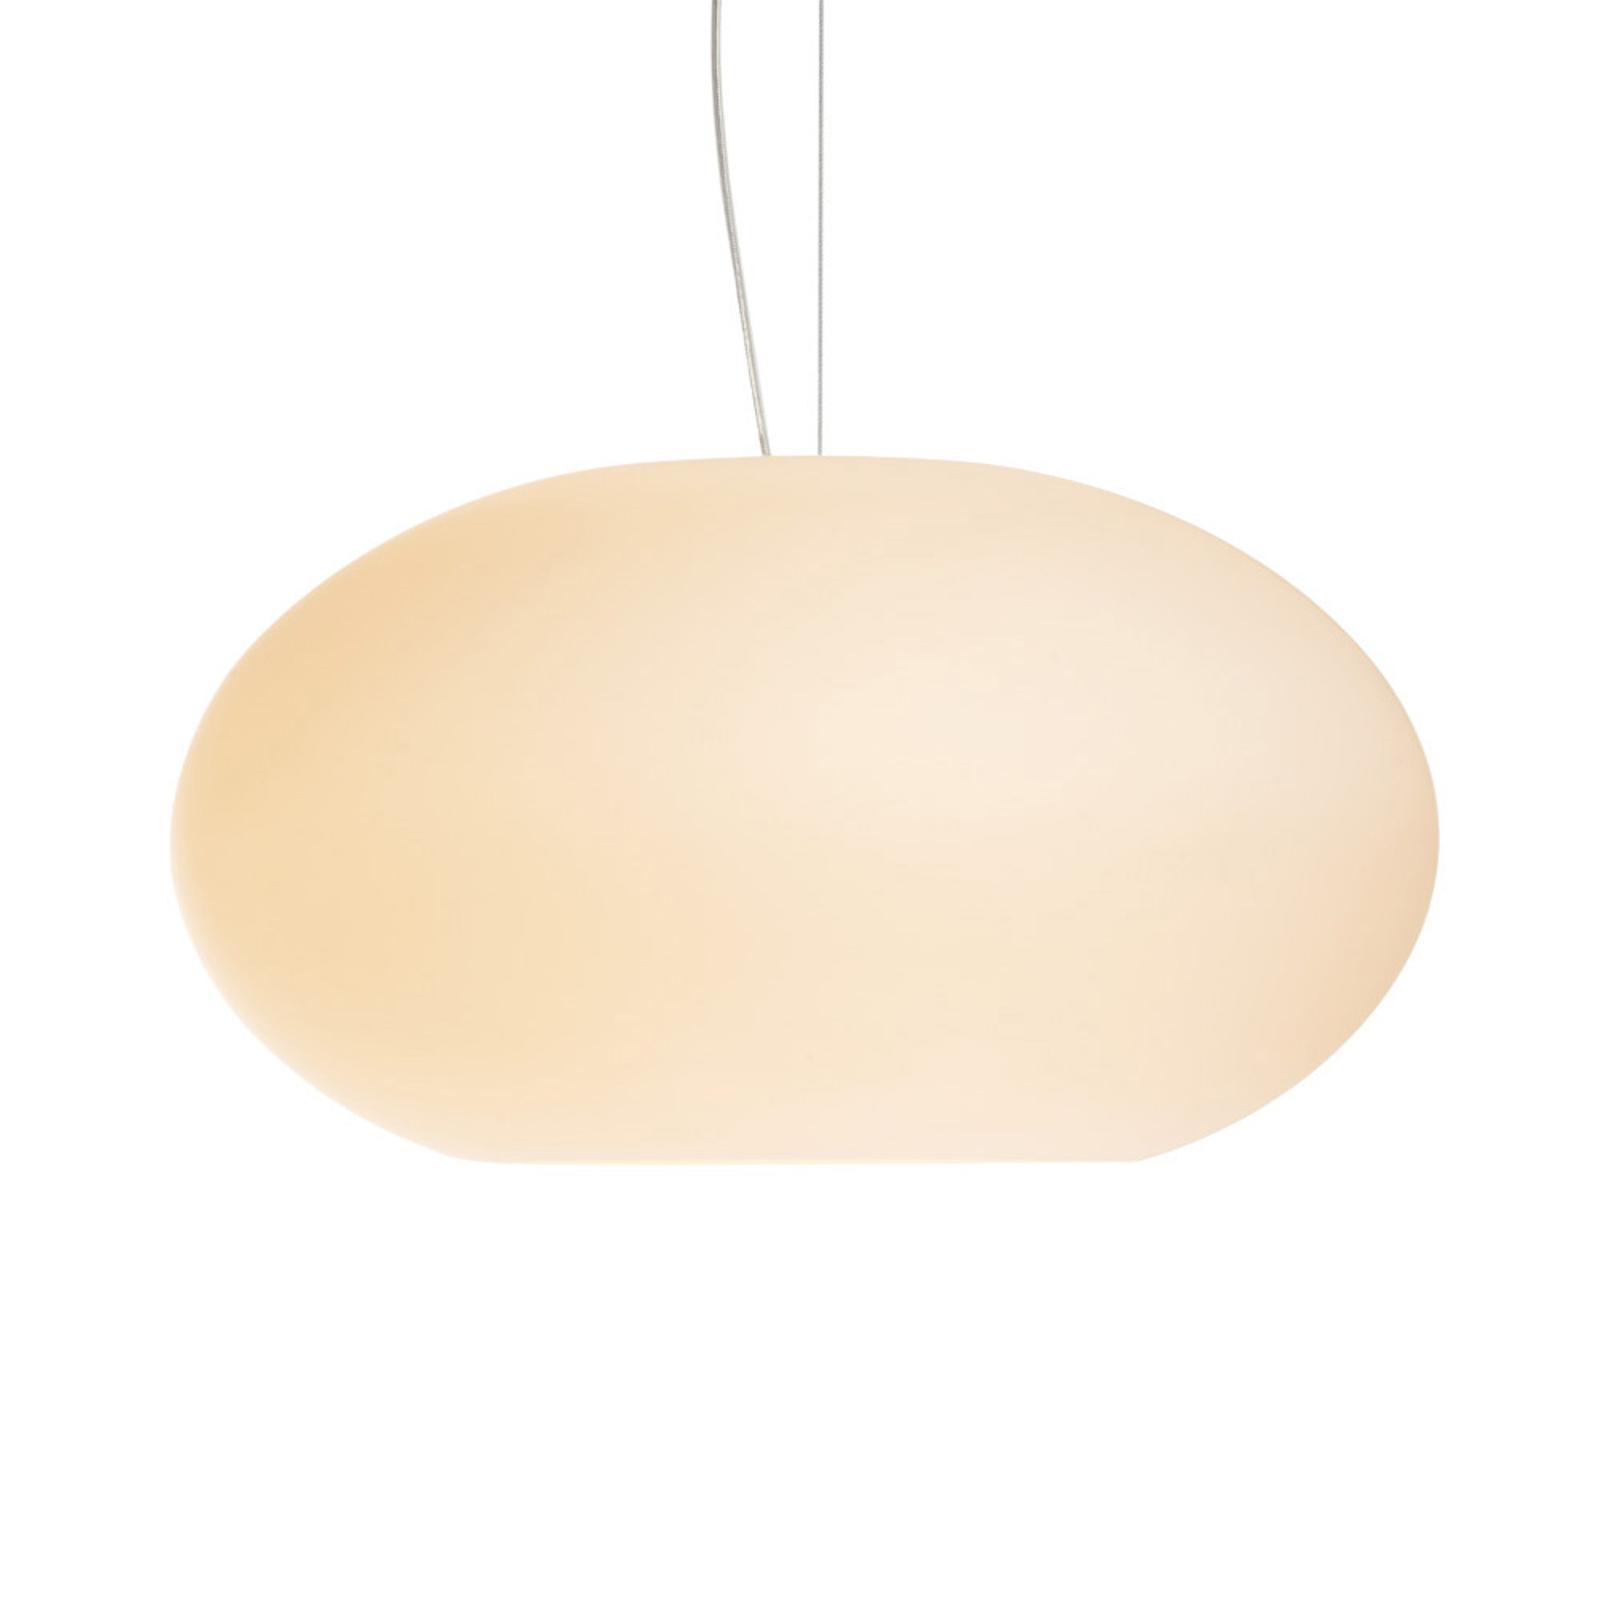 Glazen hanglamp AIH, 38 cm, crème mat